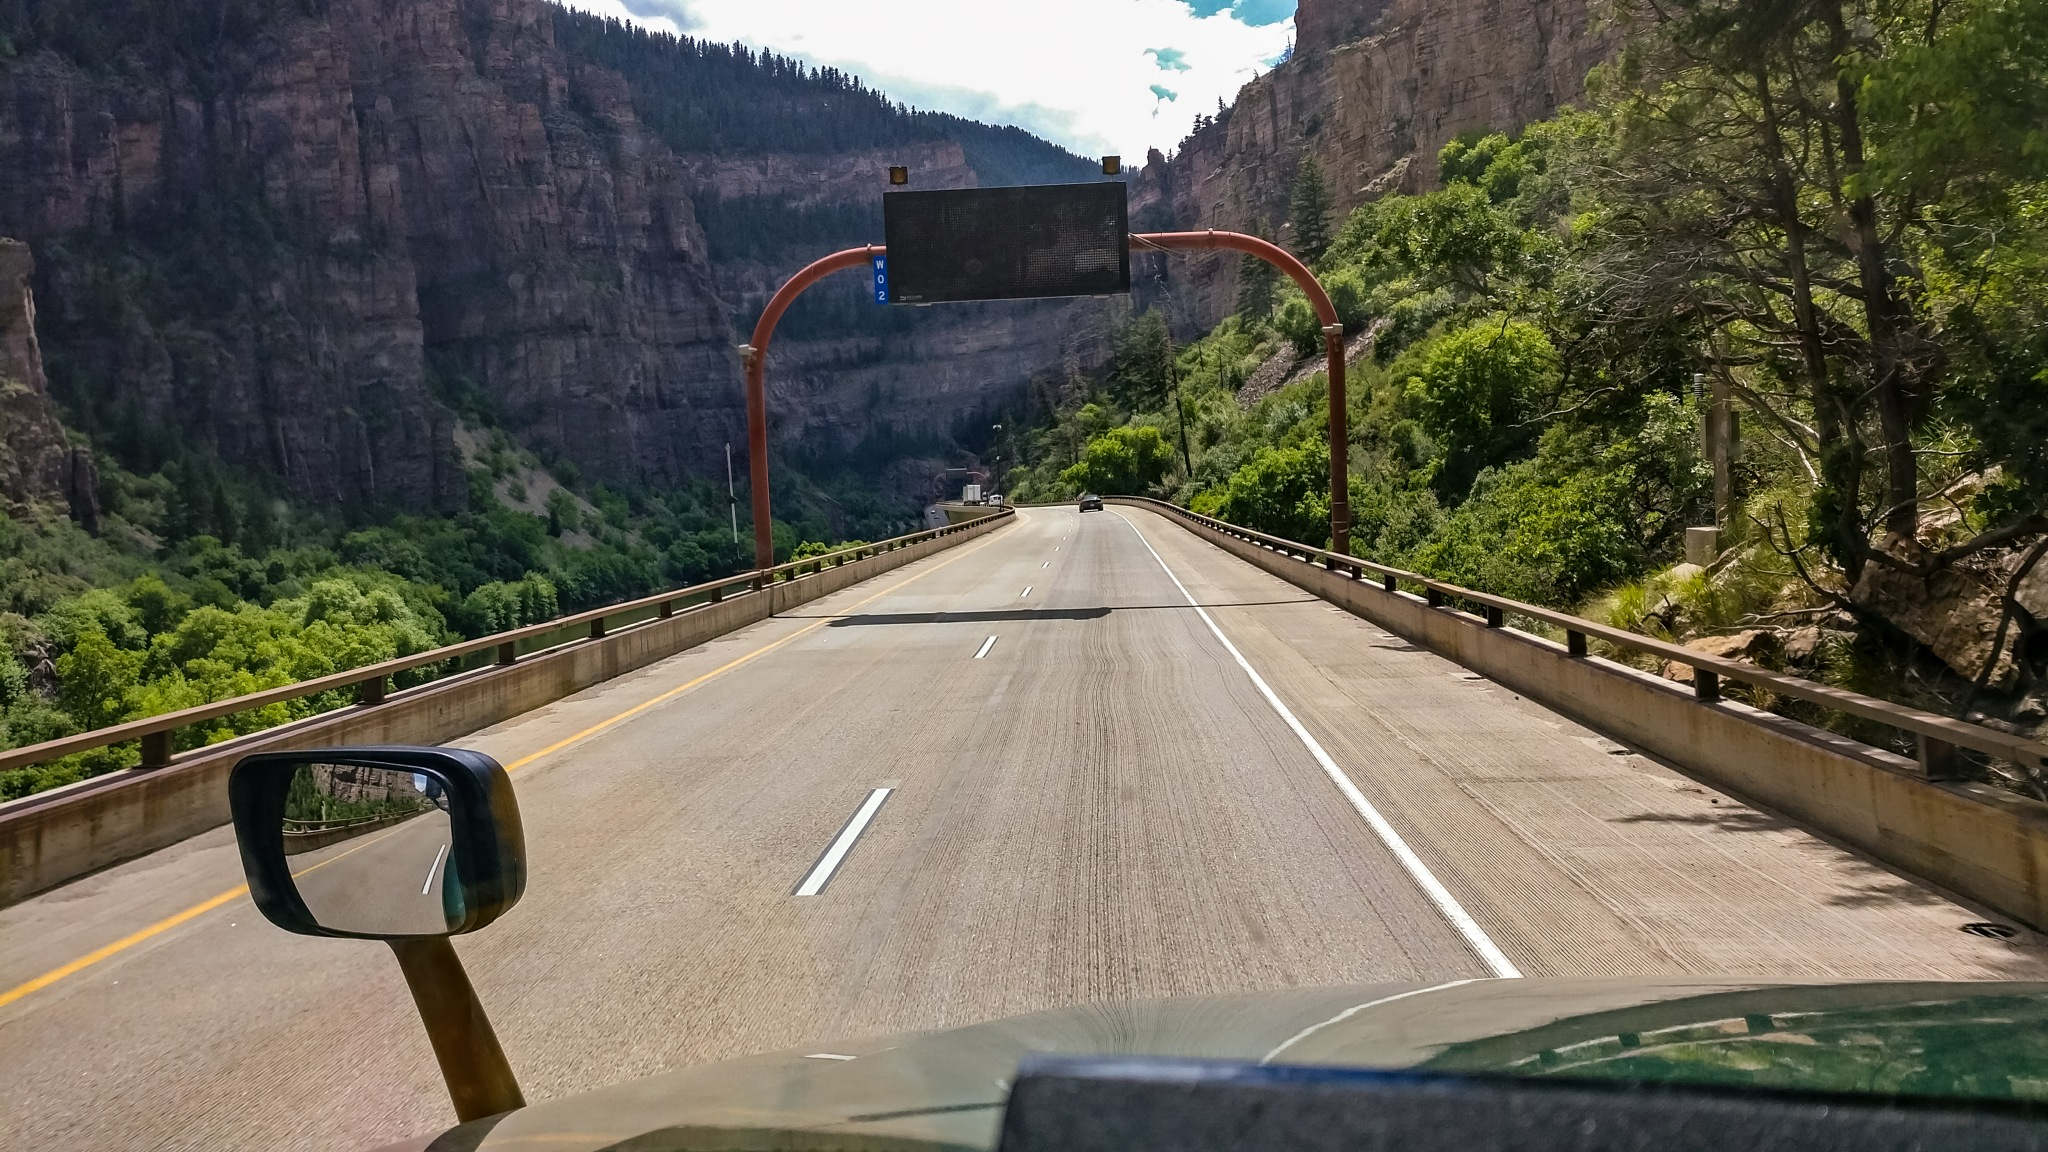 Colorado, Glenwood Canyon. by Orion Cochran